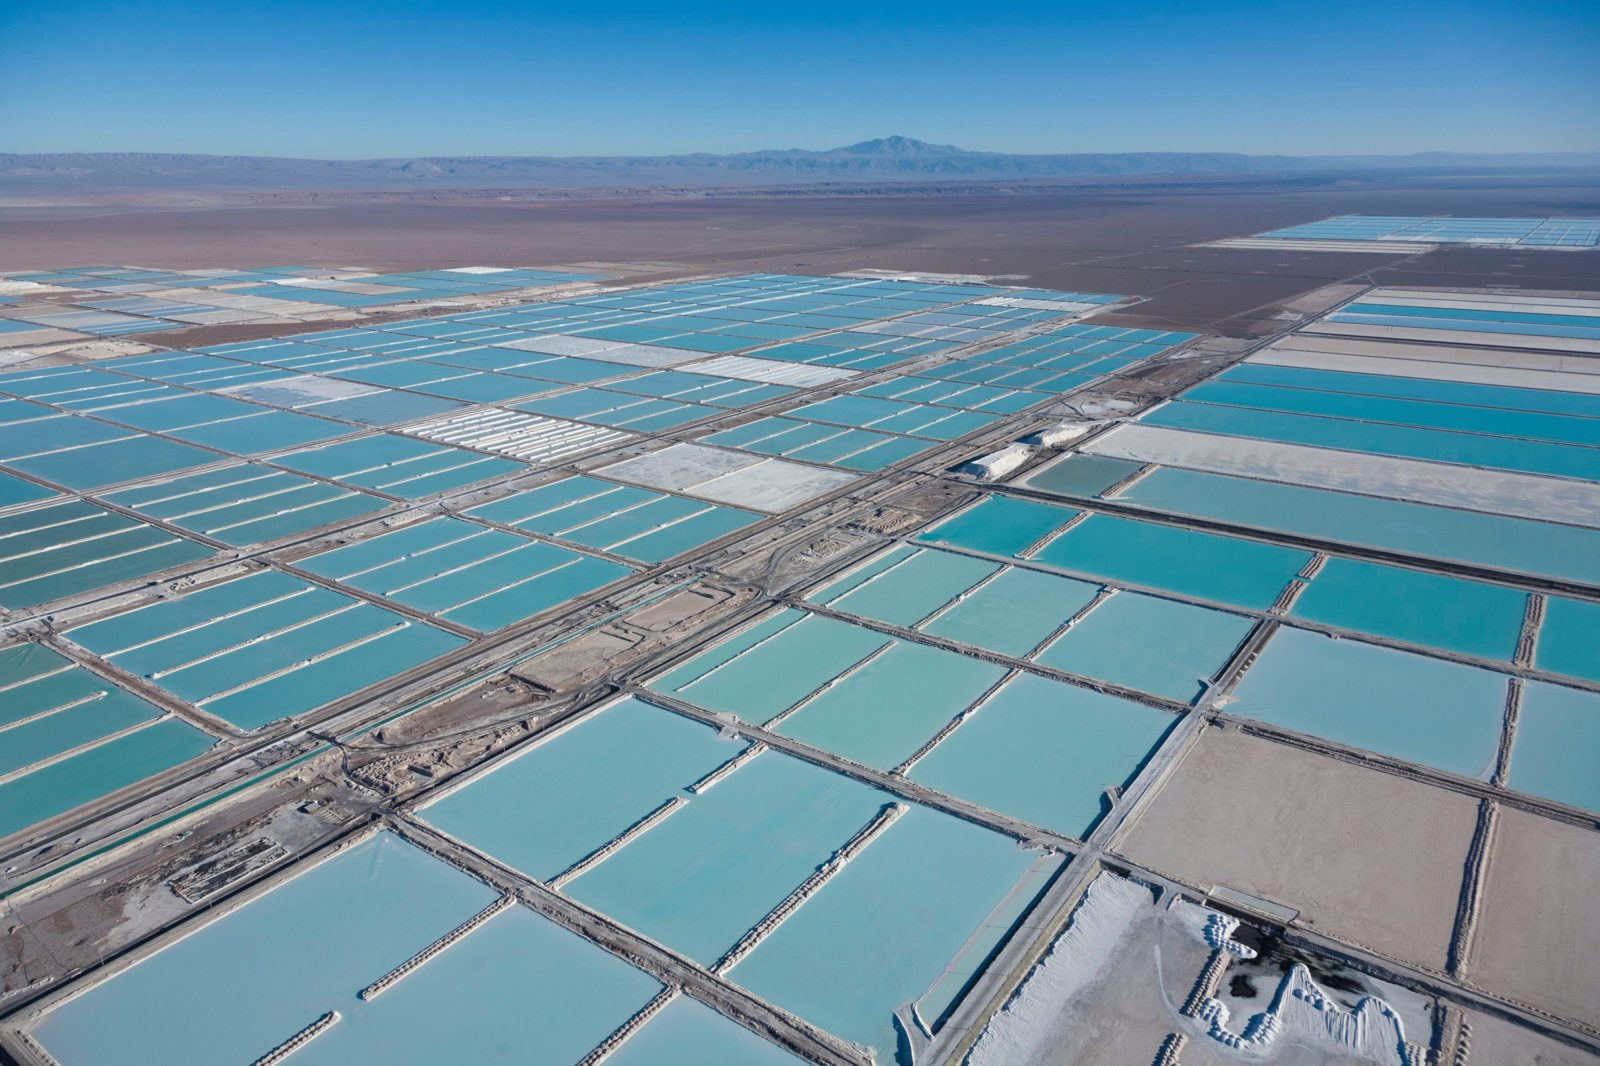 Chile, Antofagasta region, San Pedro de Atacama, Atacama salar, the world's largest lithium deposit, evaporation ponds of the Sociedad Quimica Mineral de Chile lithium mine or SQM and Sociedad Chilena del Litio or SCL (aerial view)